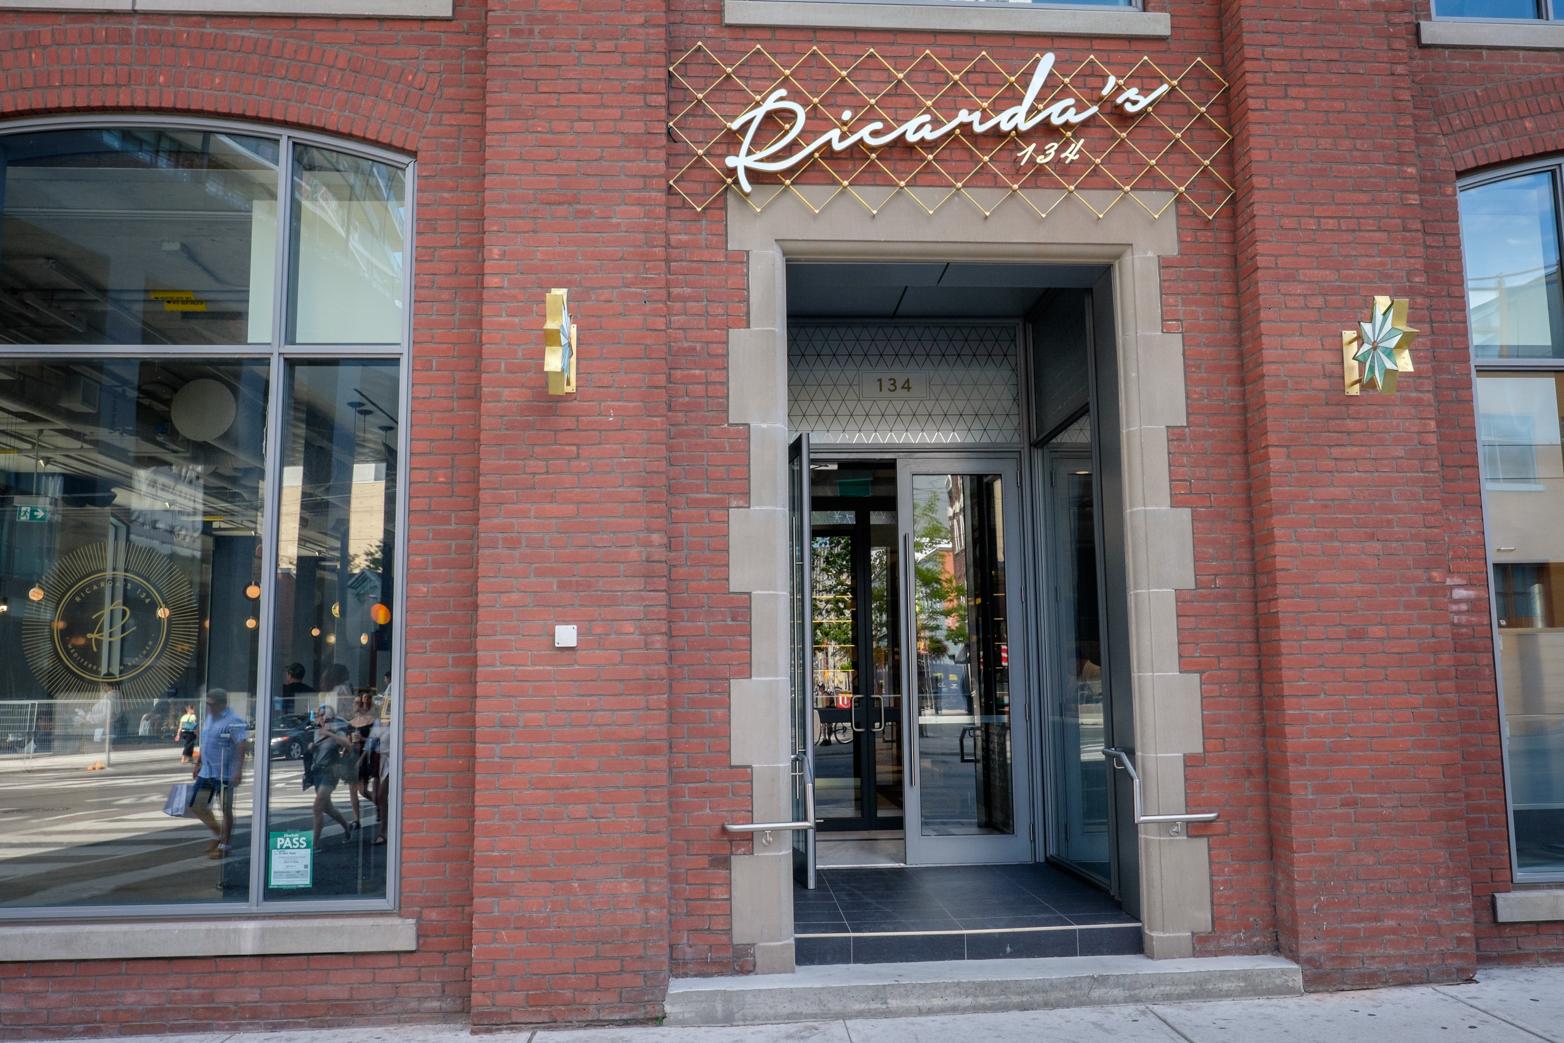 Sneak peak: Ricarda's, the new restaurant at QRC West -BisNow Toronto